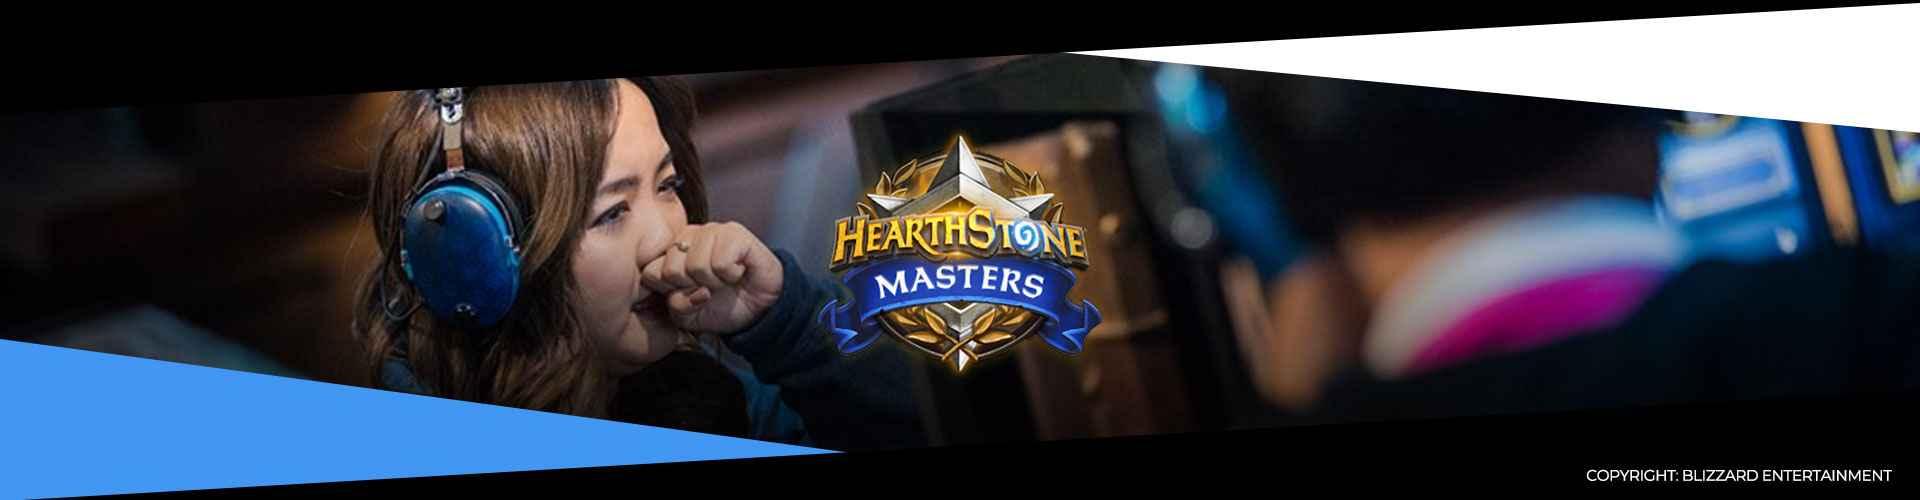 Hearthstone - Masters Tour 2020 Jönköping